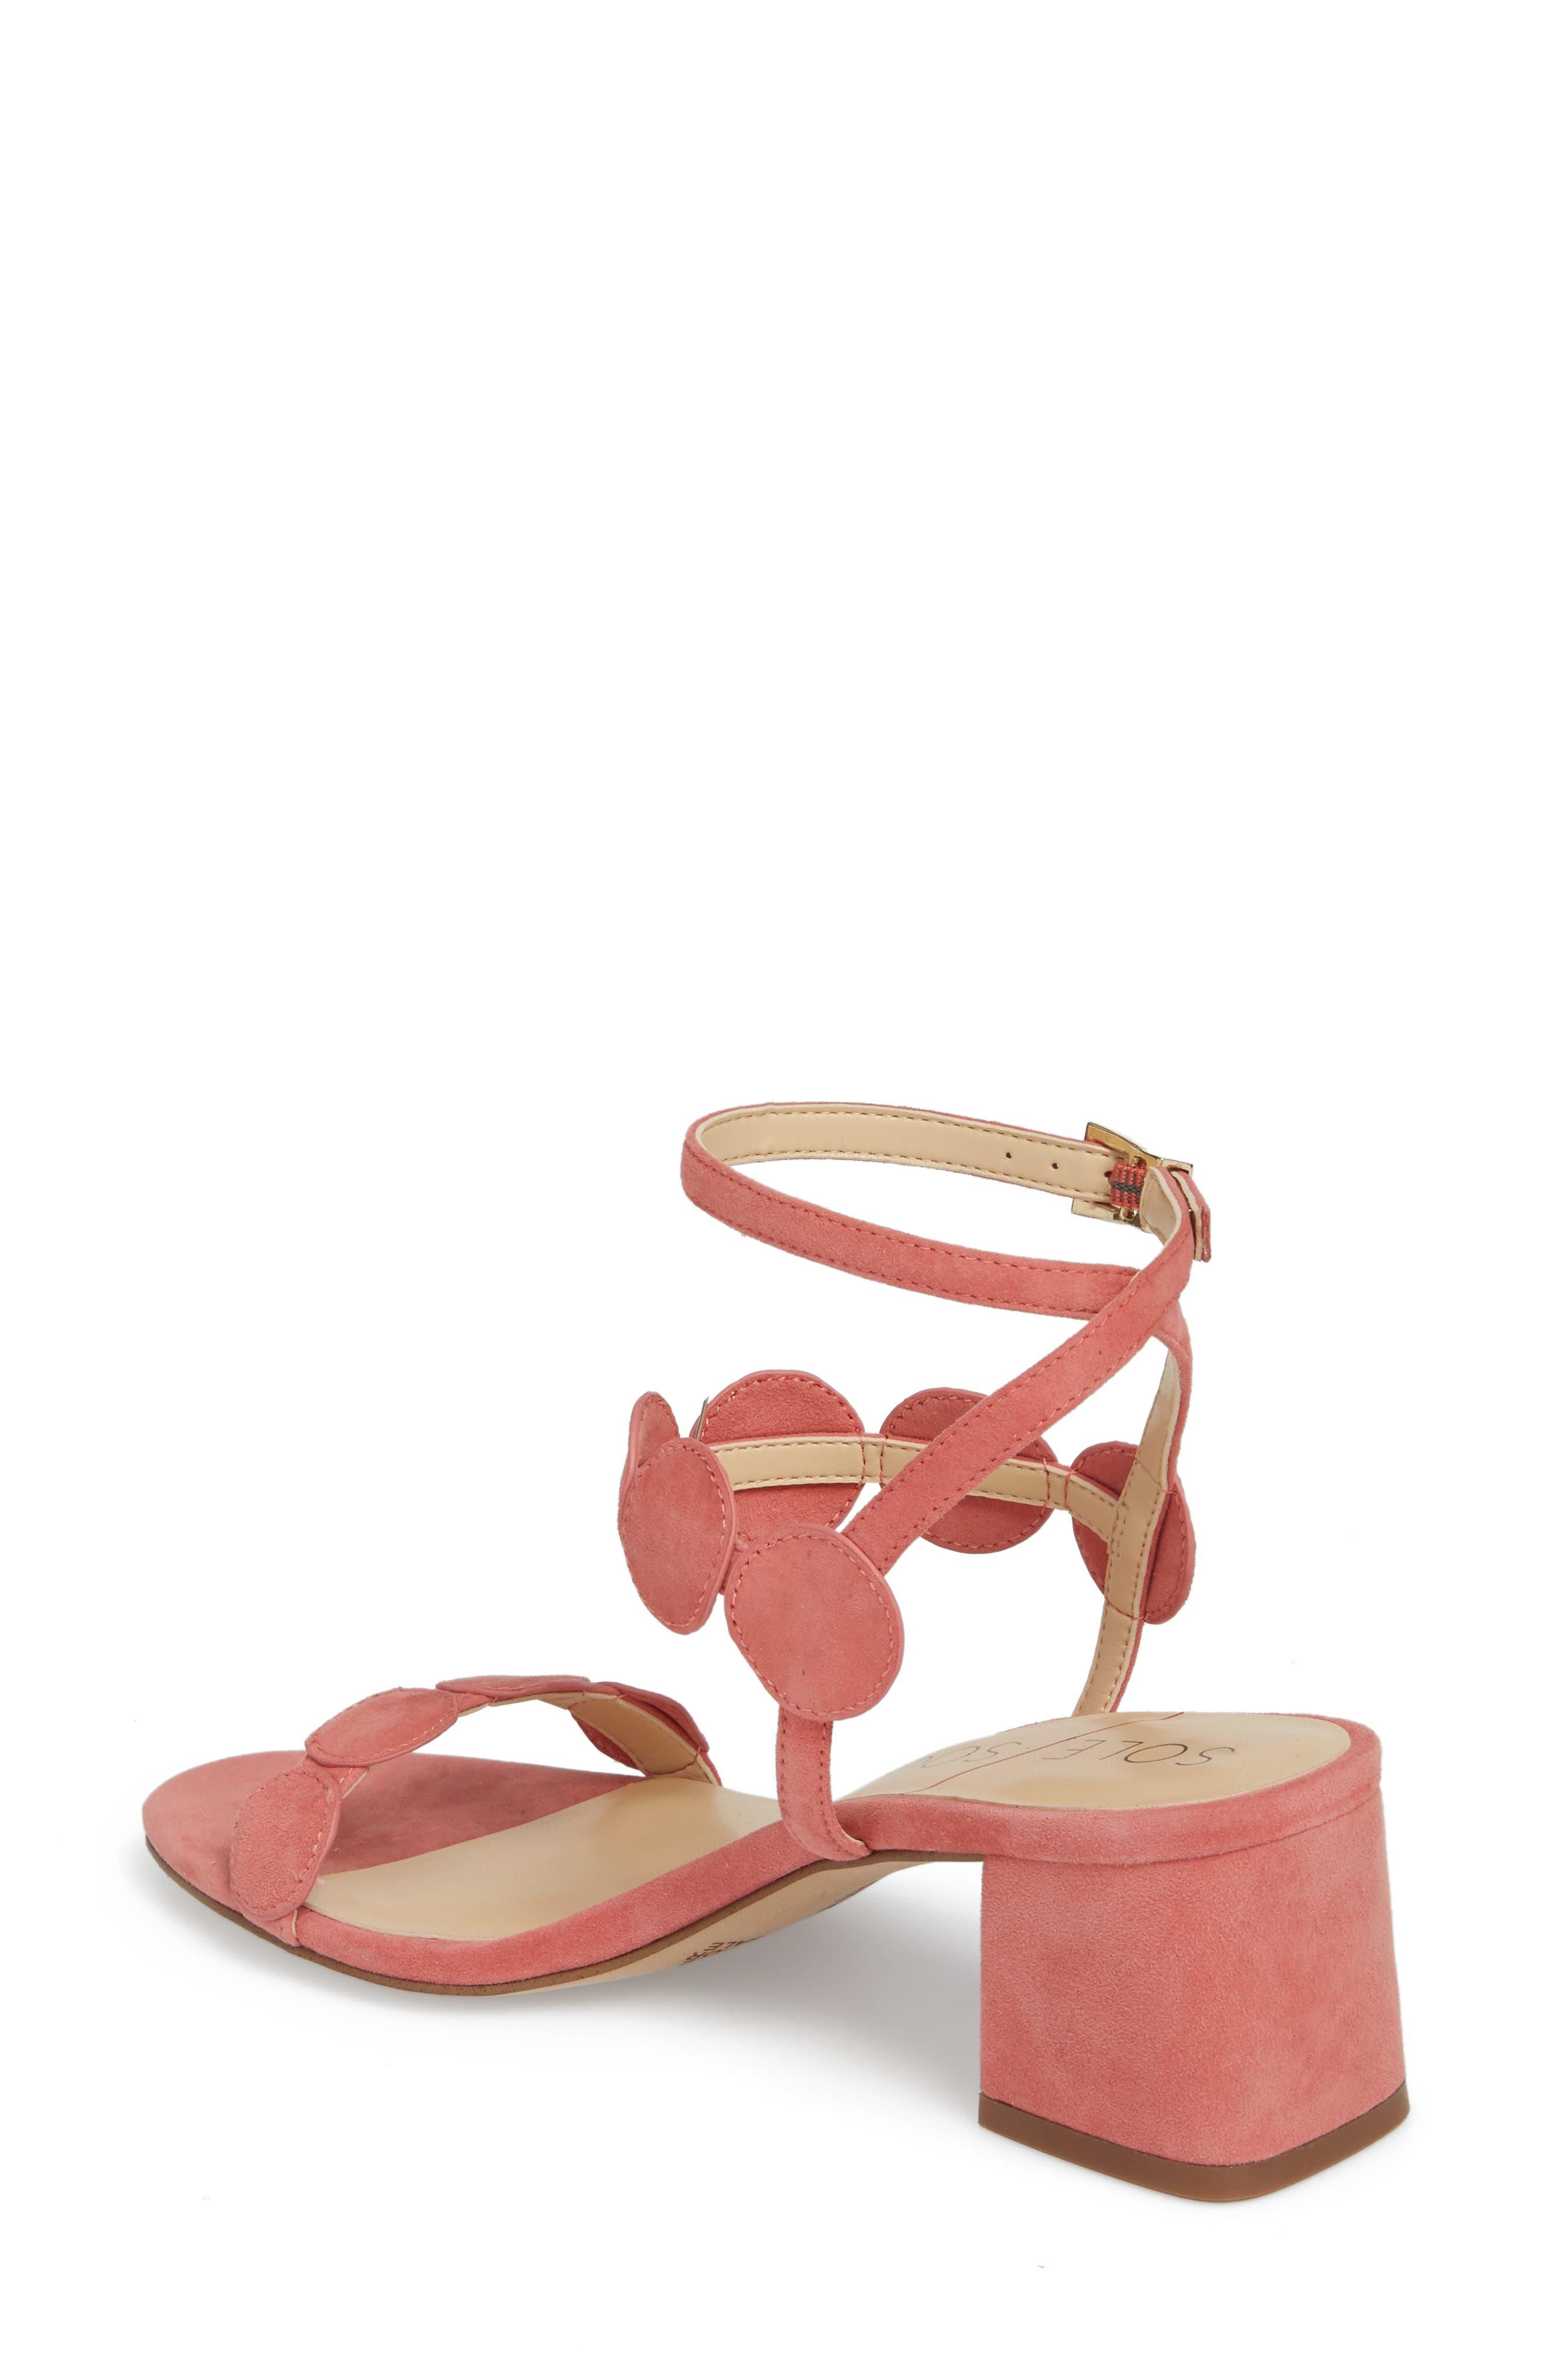 Shea Block Heel Sandal,                             Alternate thumbnail 10, color,